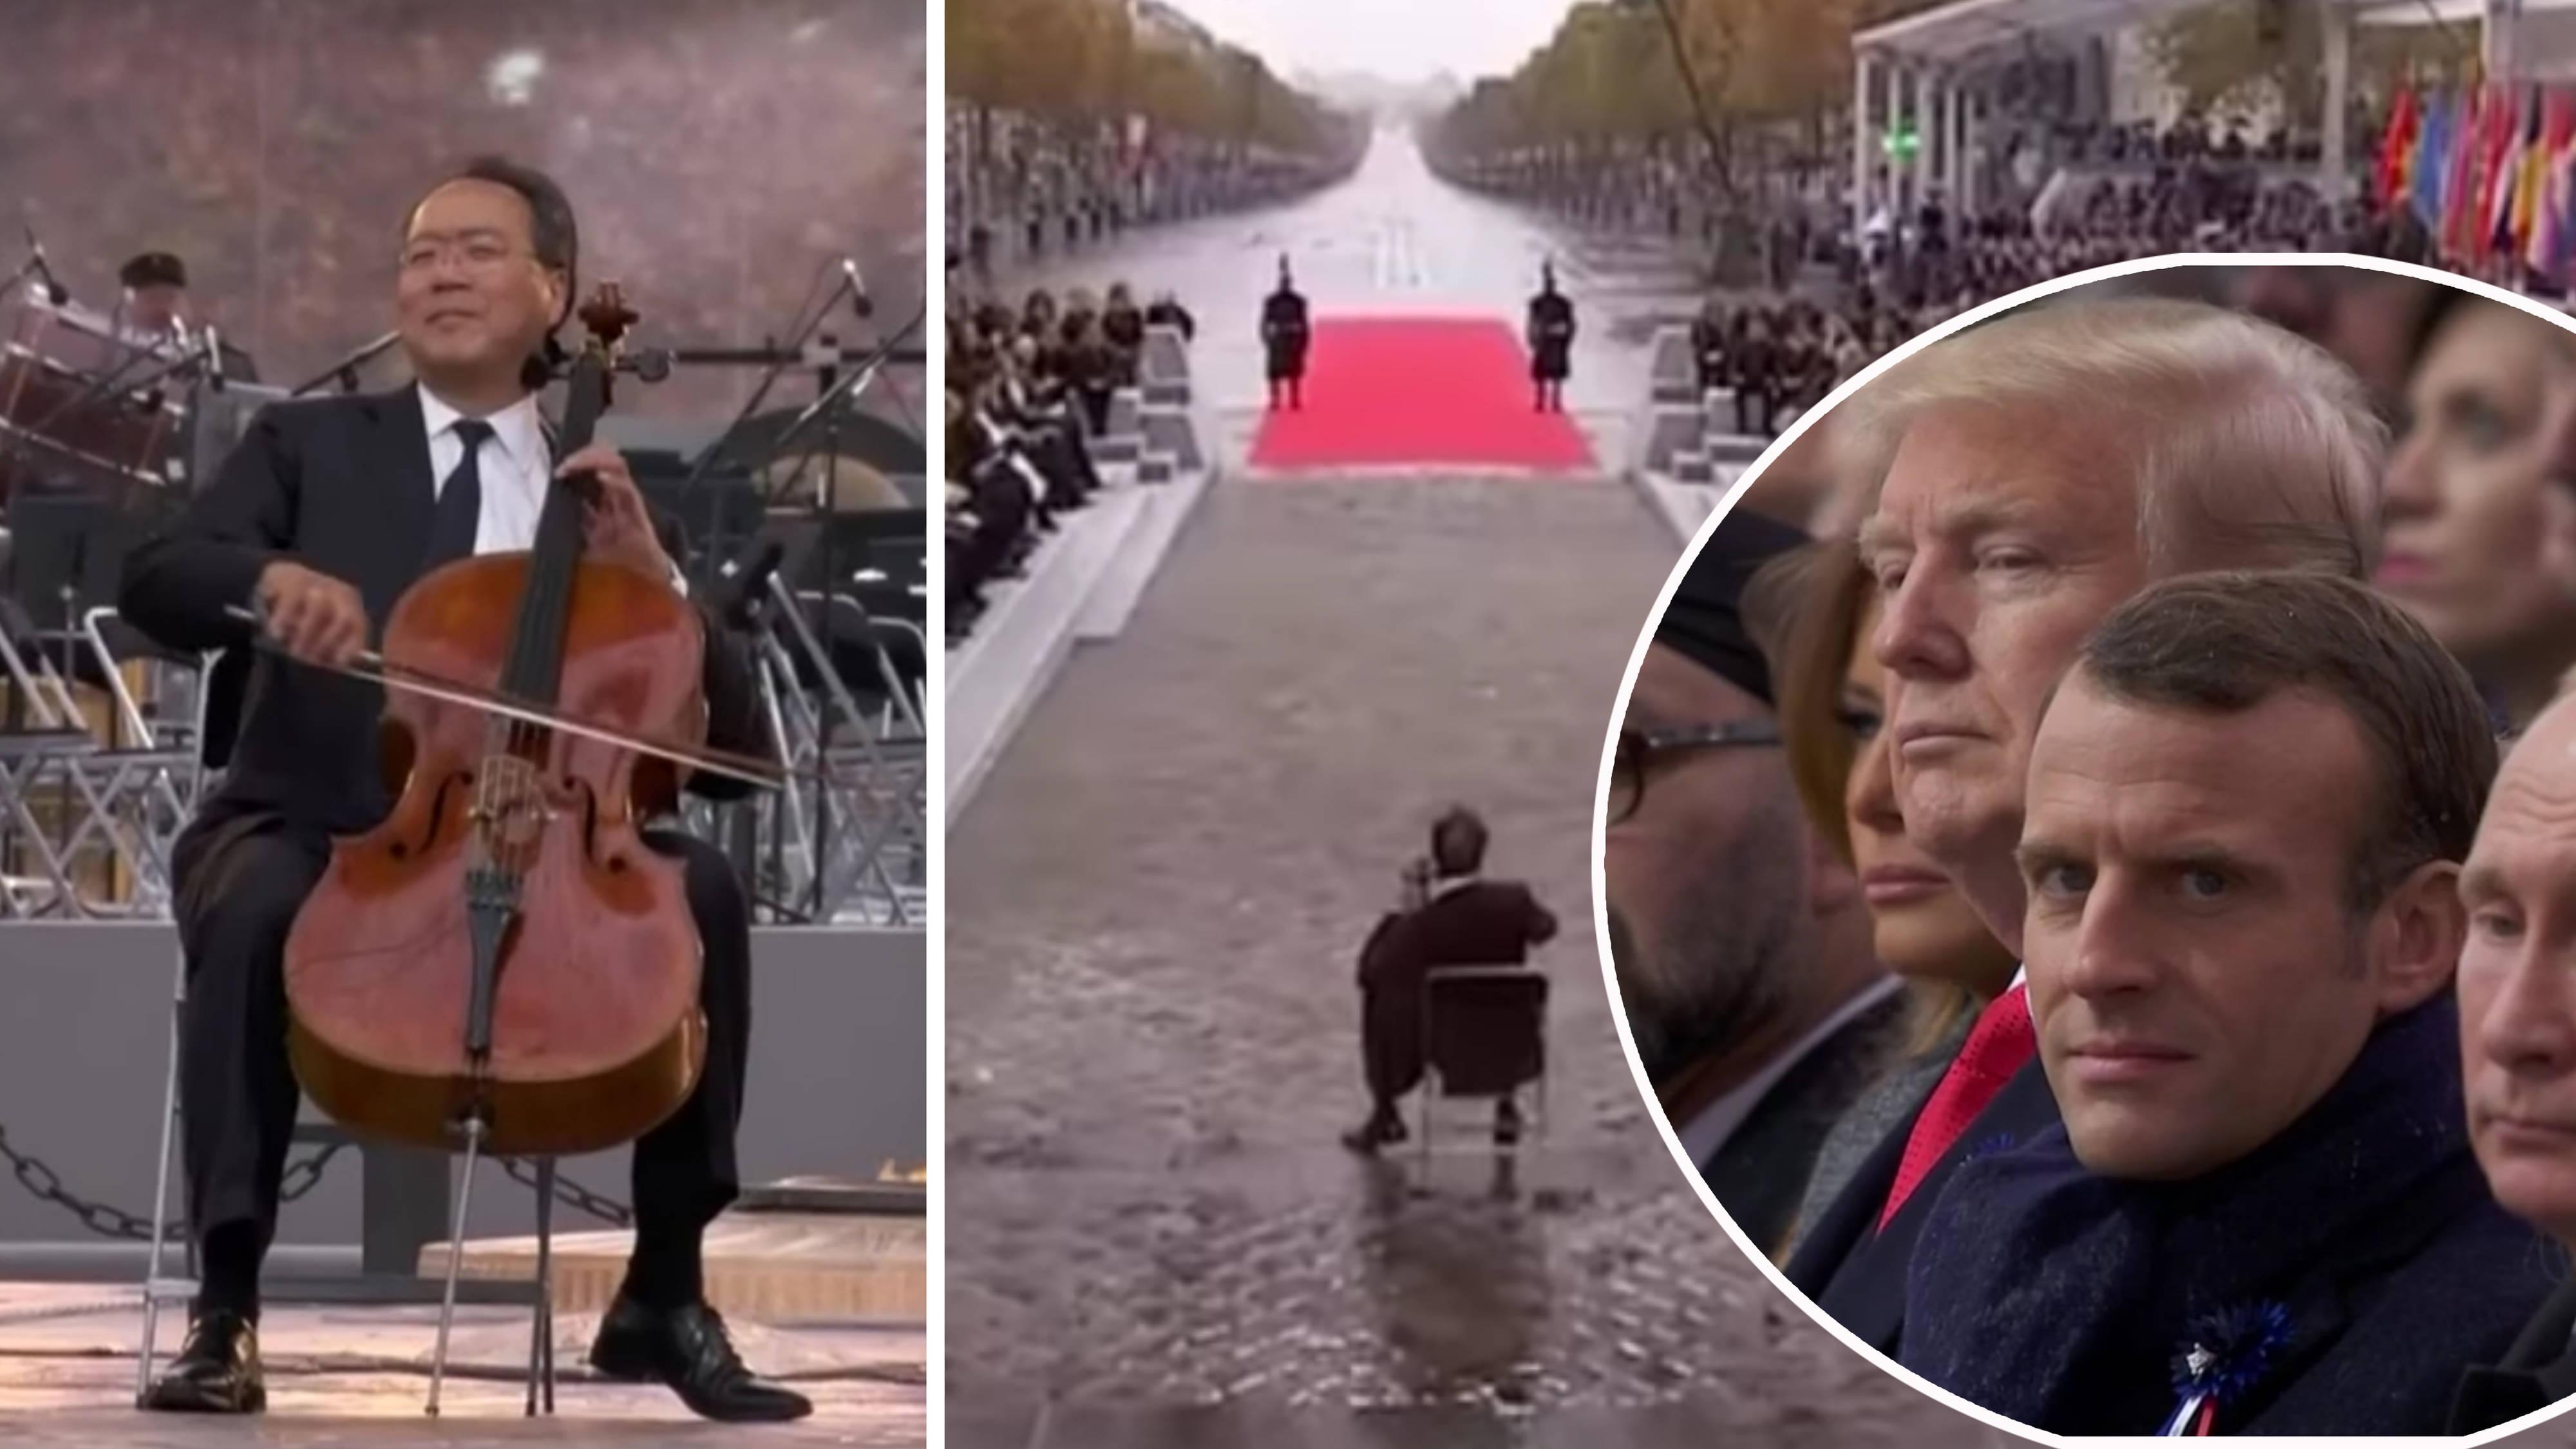 Yo-Yo Ma performs during the Armistice ceremony in Paris